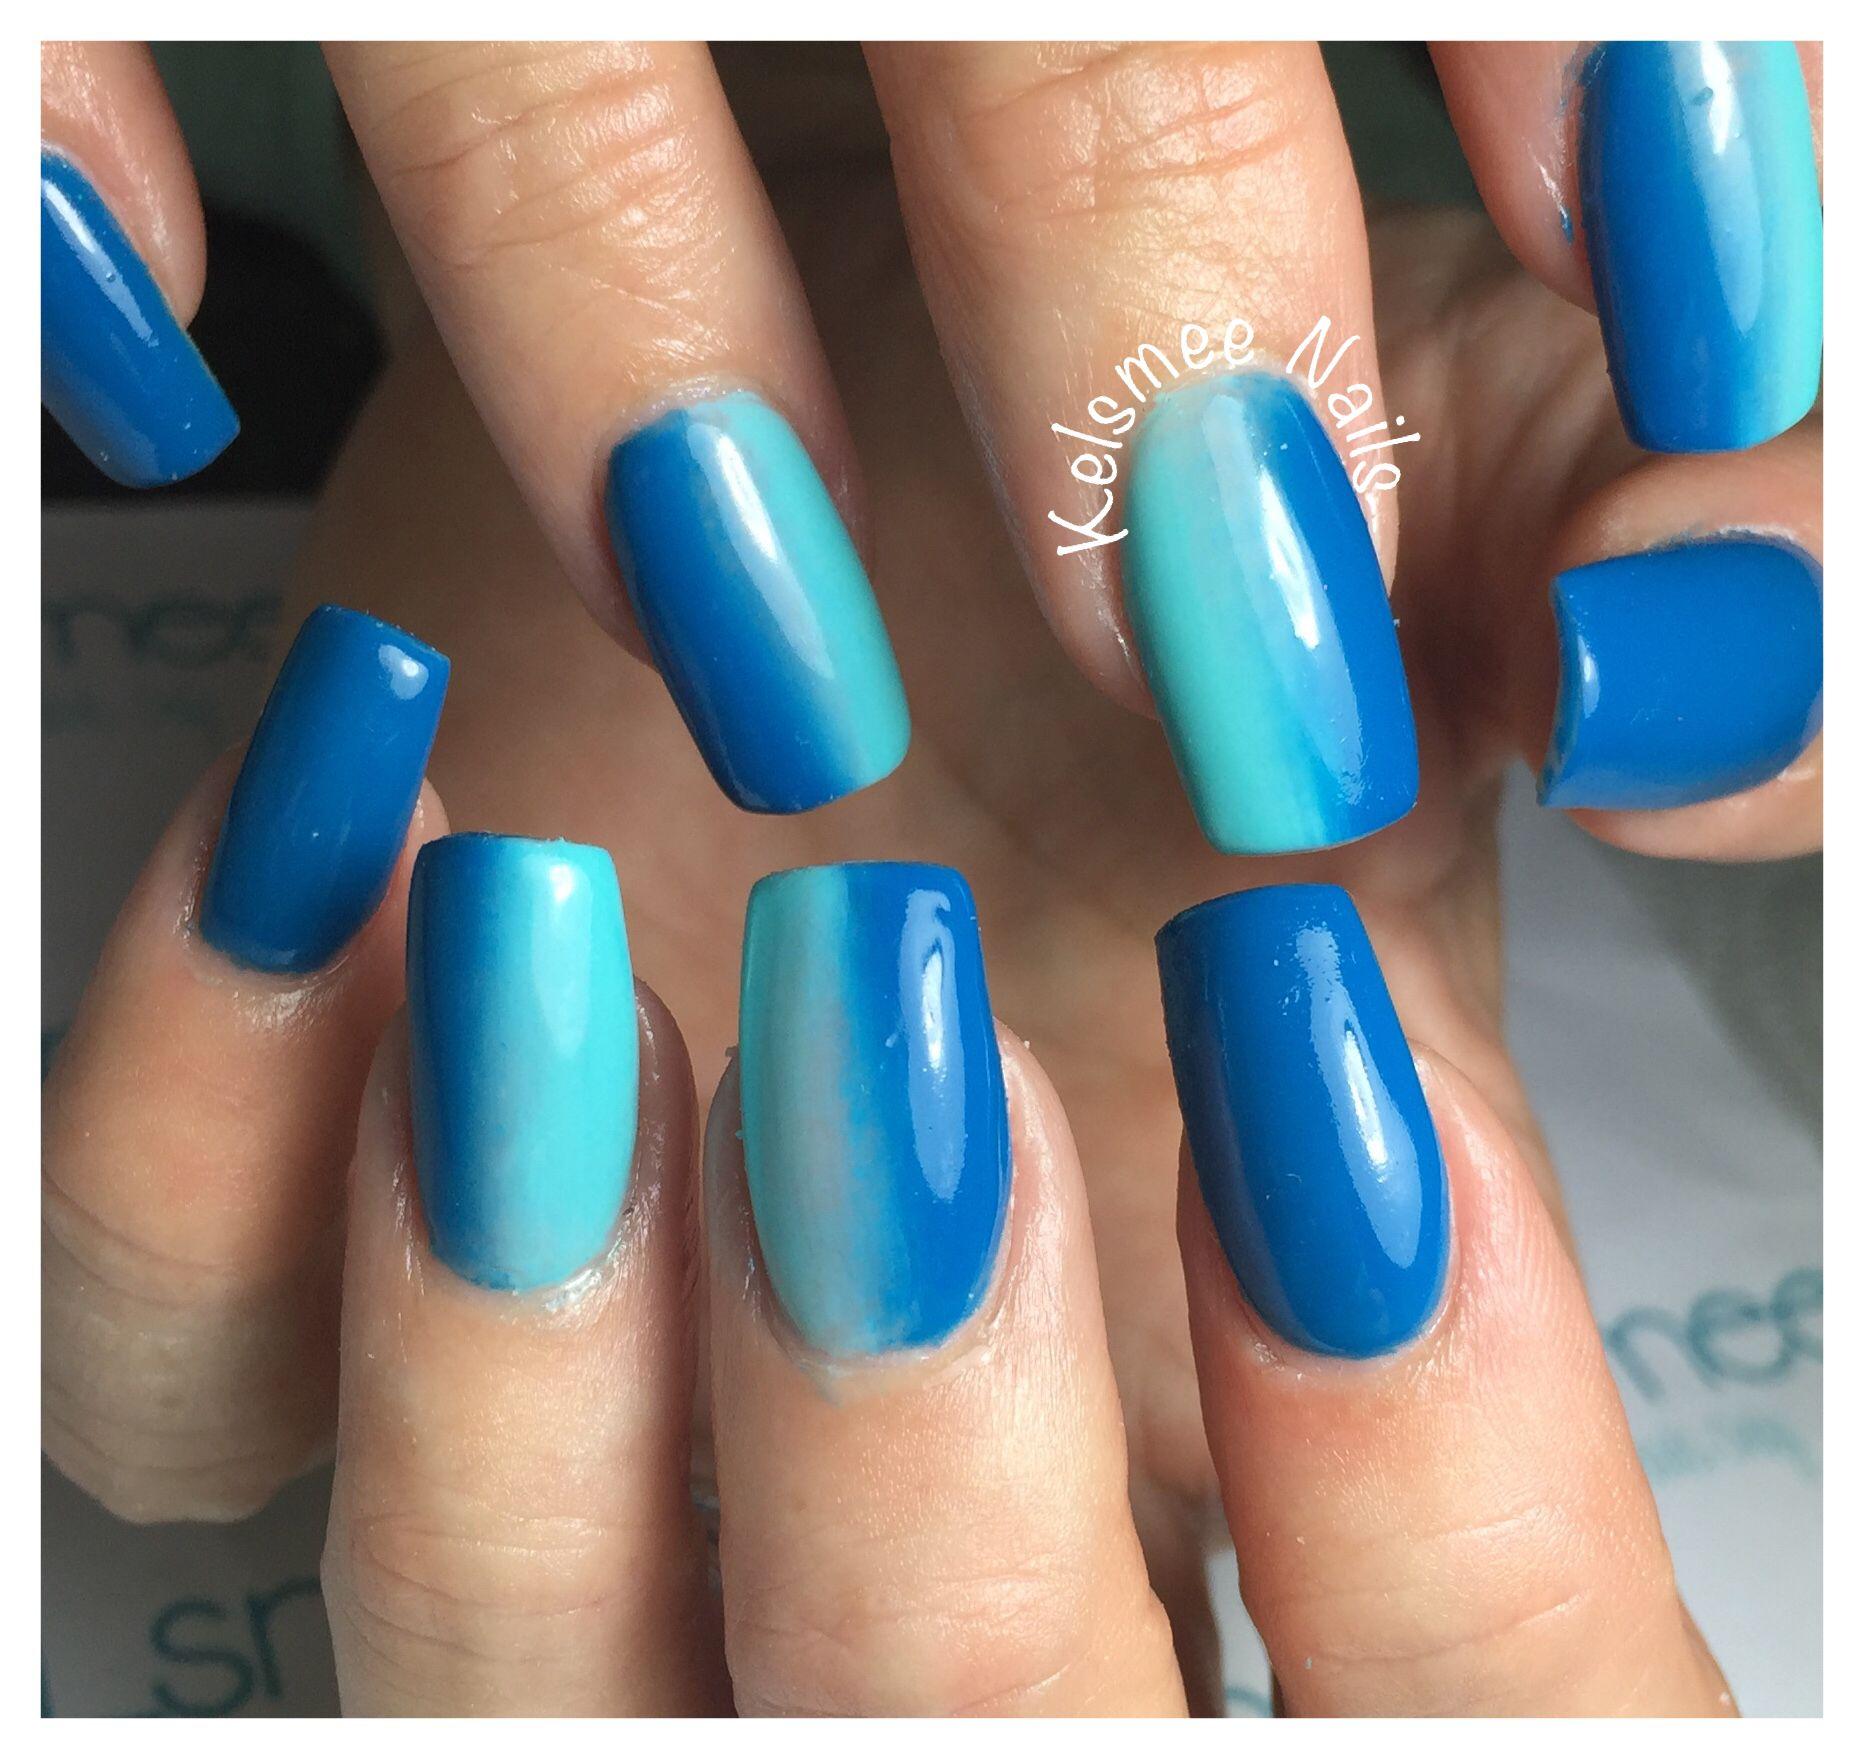 Blue nails, ombre | Nail Art Community Pins | Pinterest | Schuhe